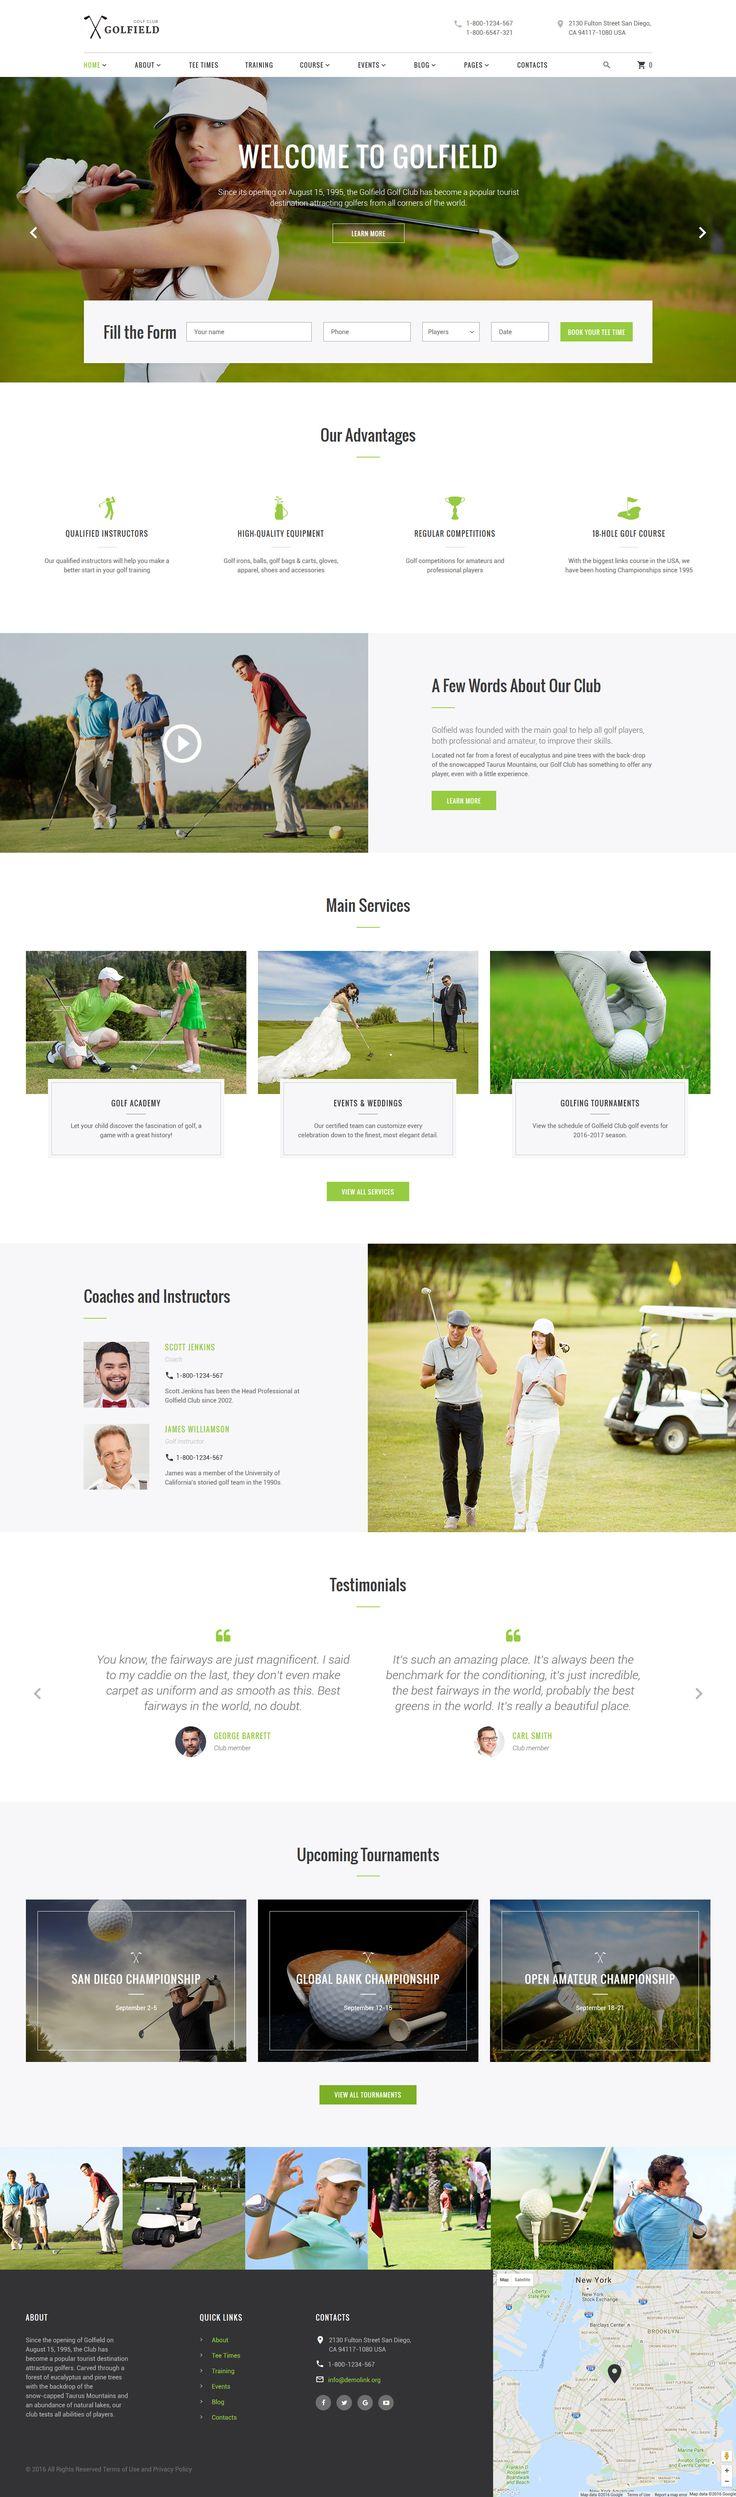 Golf Responsive Website Template - https://www.templatemonster.com/website-templates/golf-responsive-website-template-61283.html